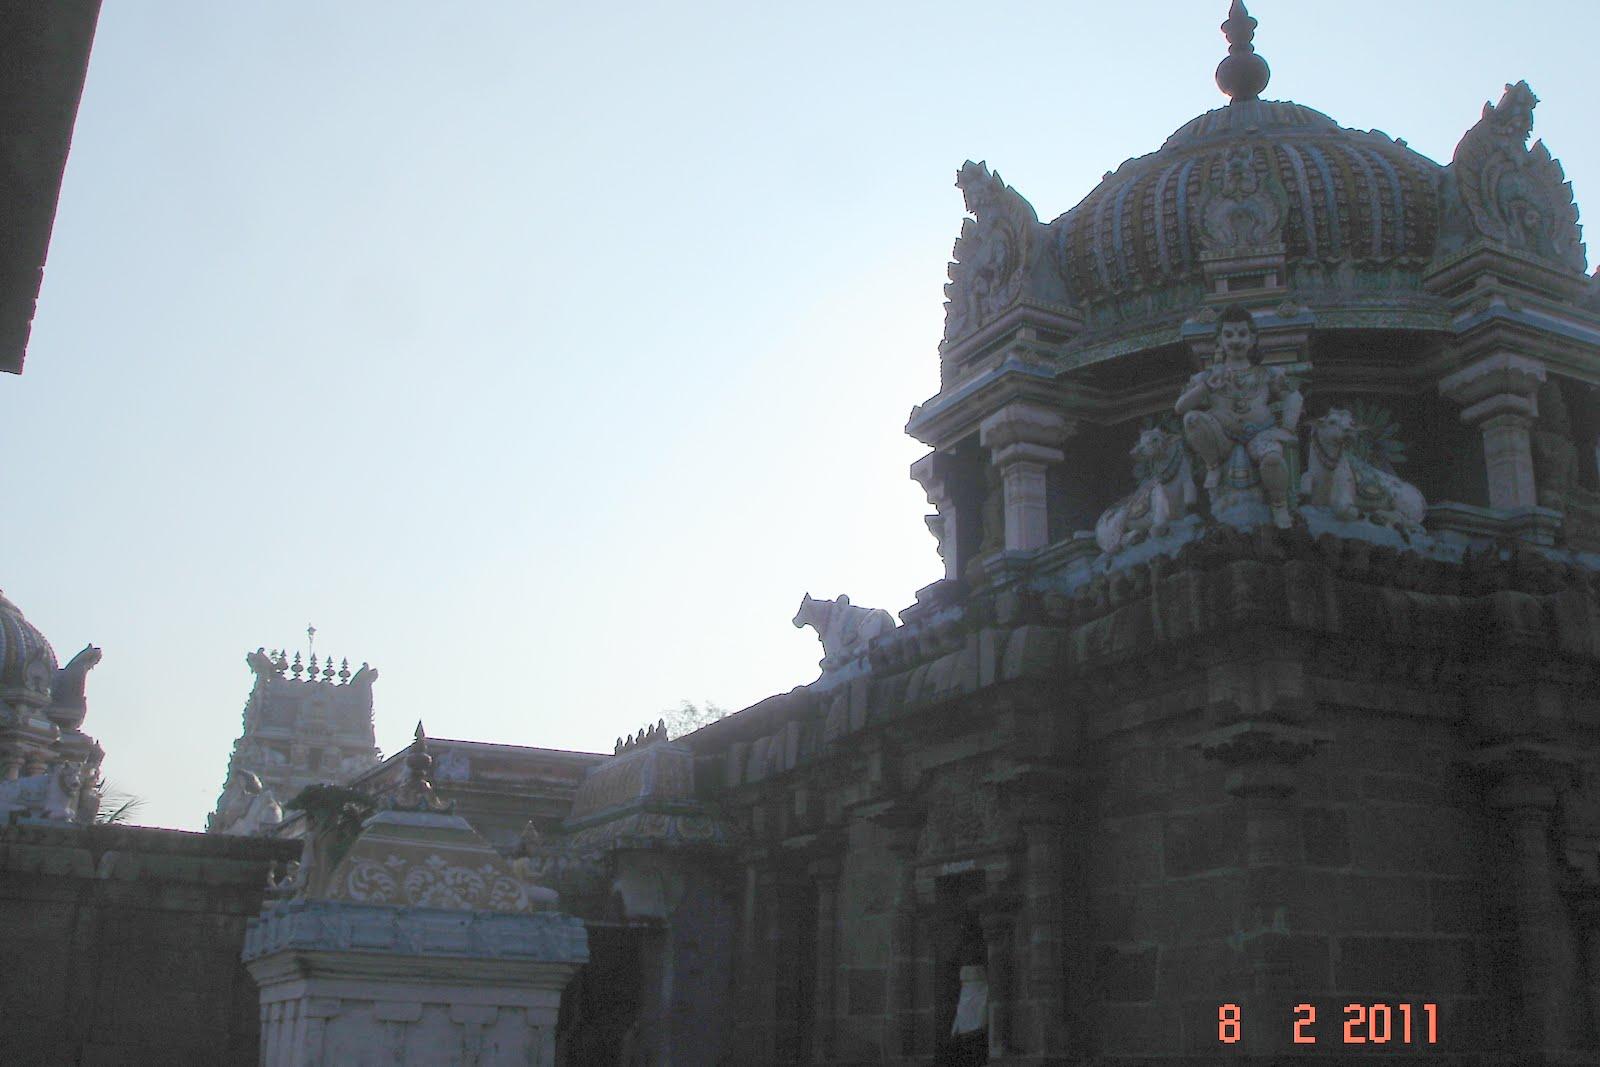 Sri Uchinatheswarar Temple, Thirunelvayil, Chidambaram - 275 Shiva Temples